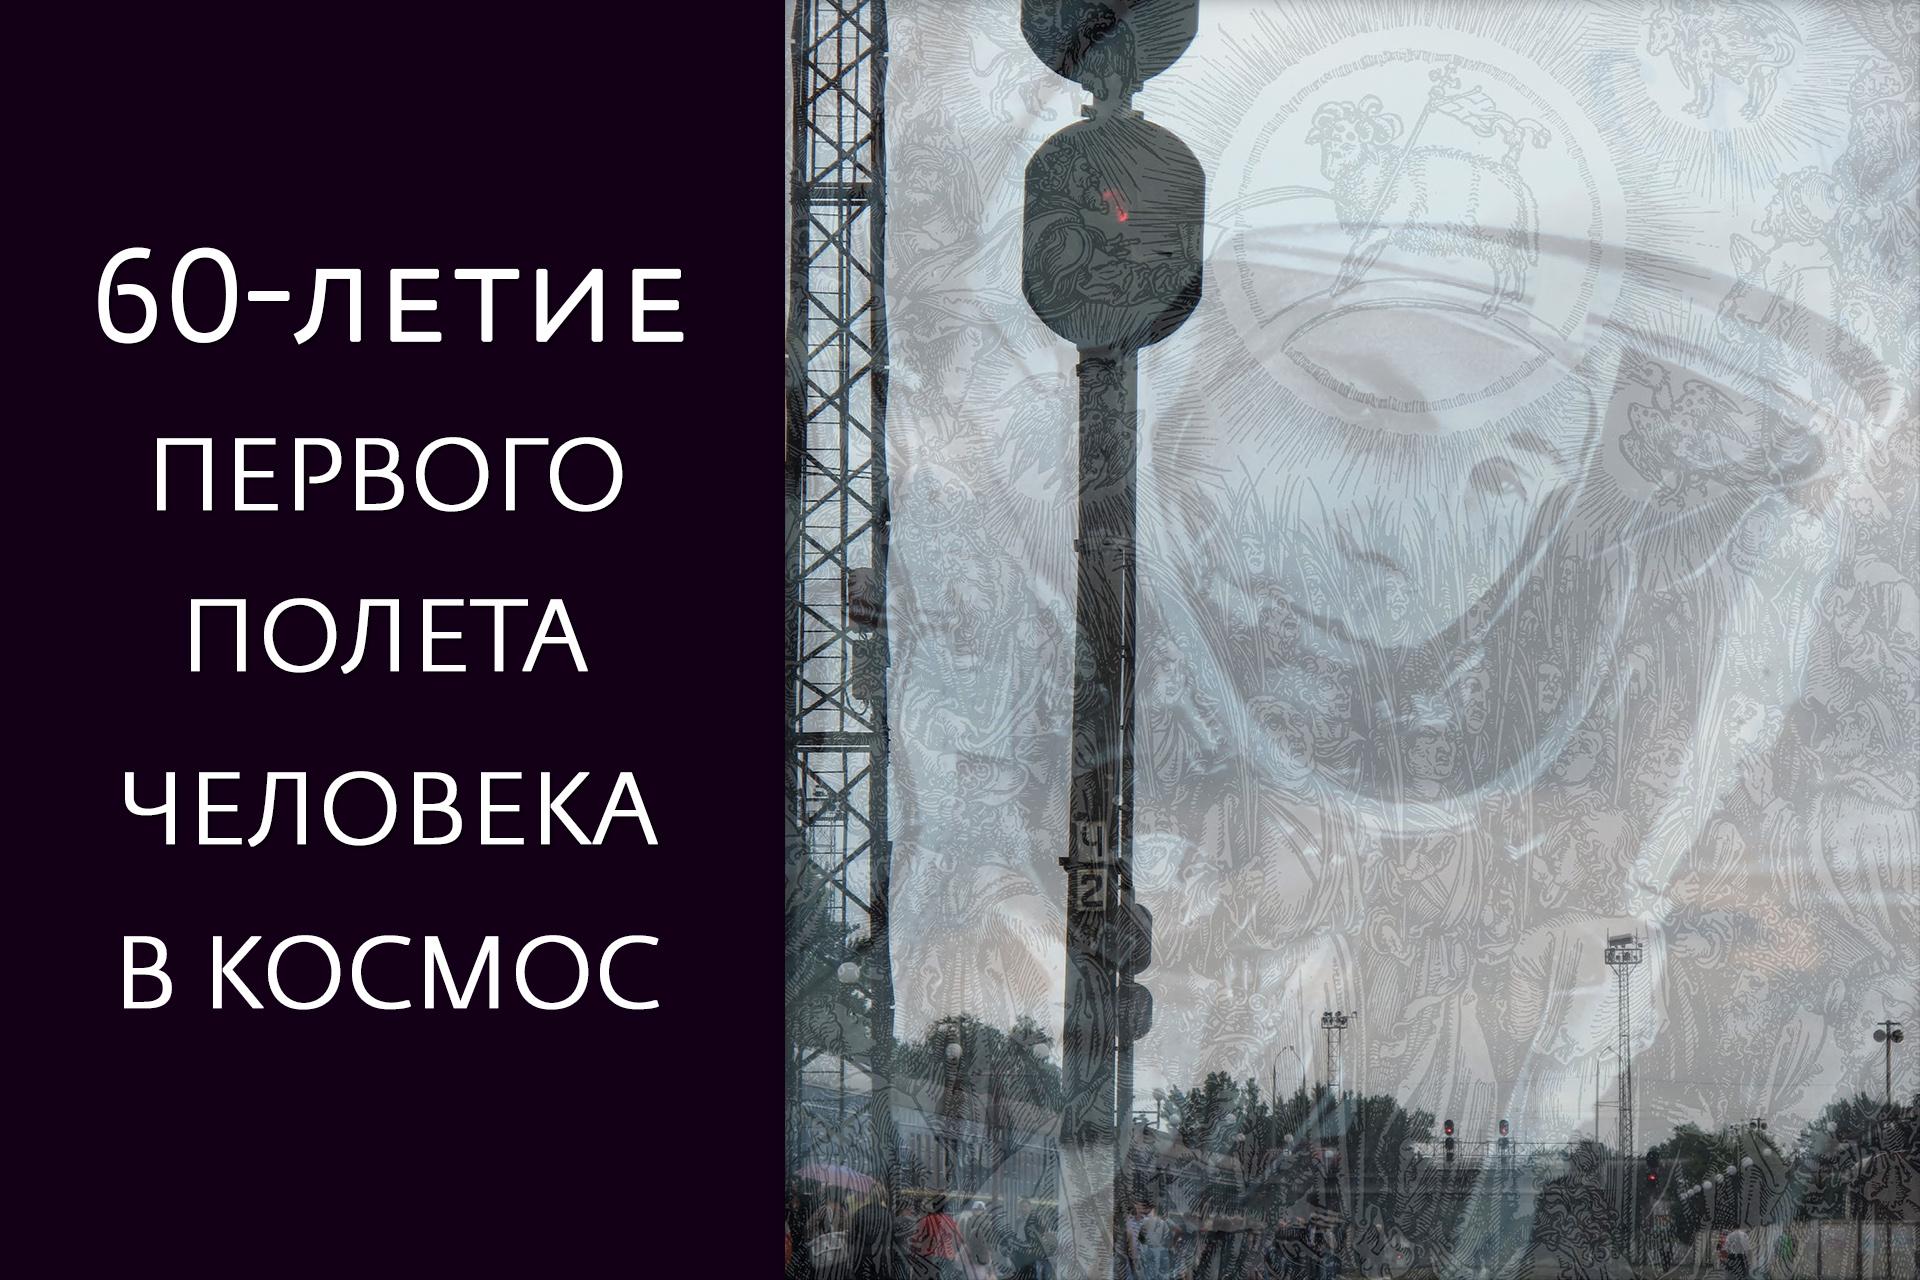 Неизвестный Гагарин: мистика и парадоксы «космического Колумба»